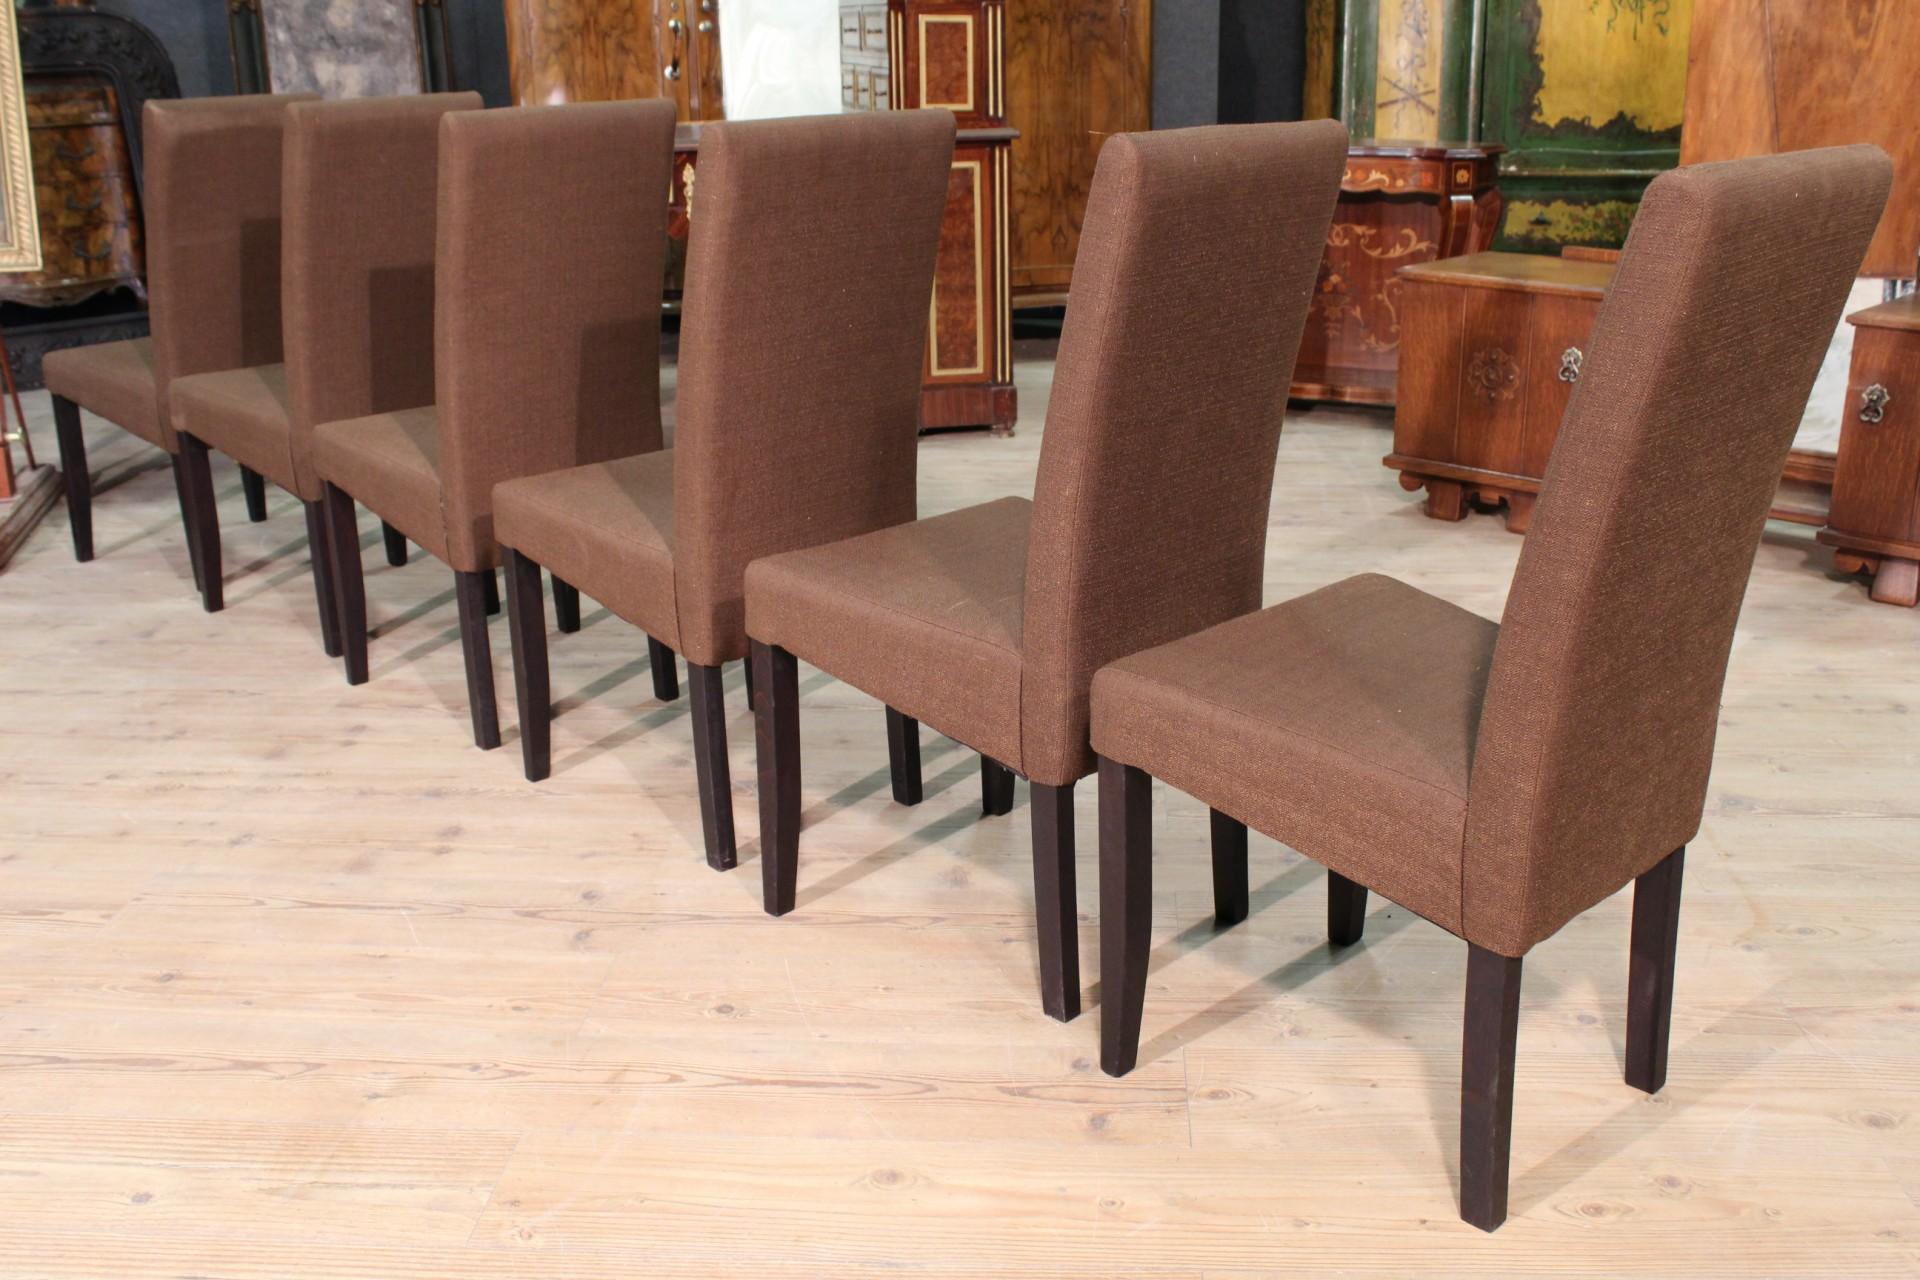 Gruppo di 6 sedie rivestite in tessuto - Vendita Online Antiquariato ...